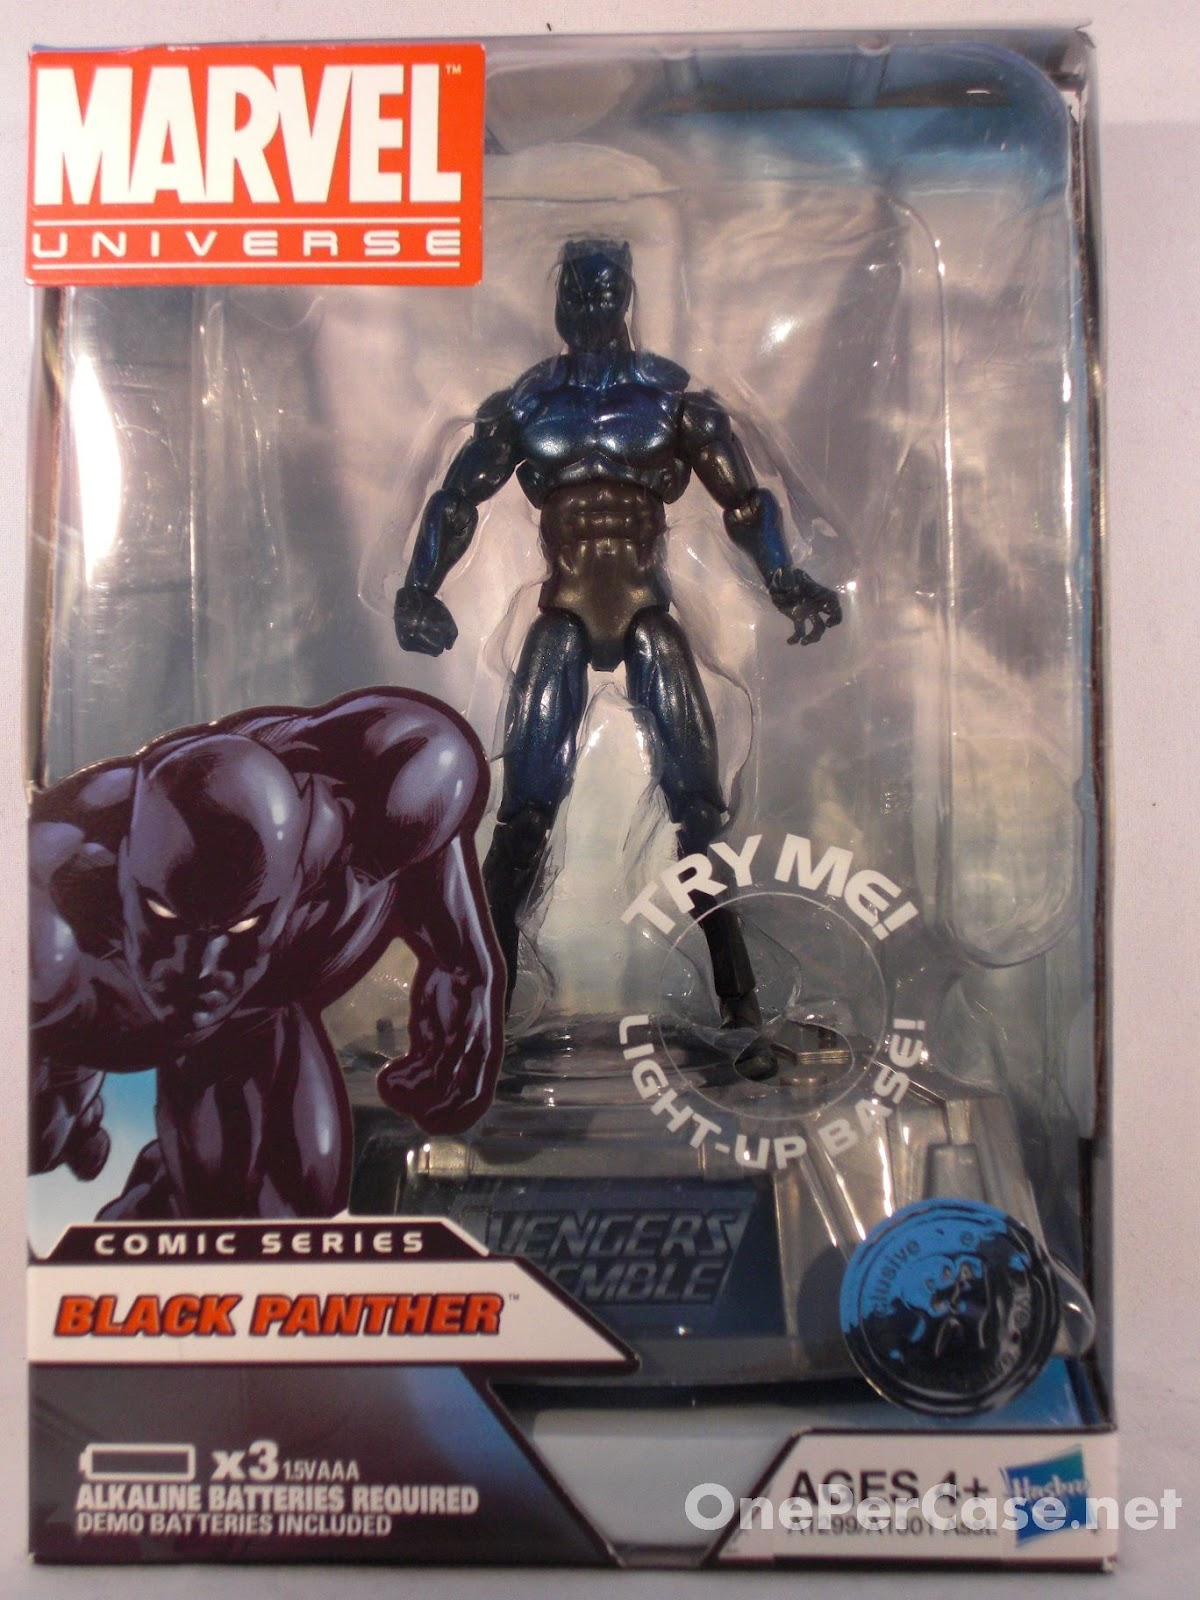 One Per Case: Marvel Universe Avengers Light-Up Base Wave 2 - Black Panther